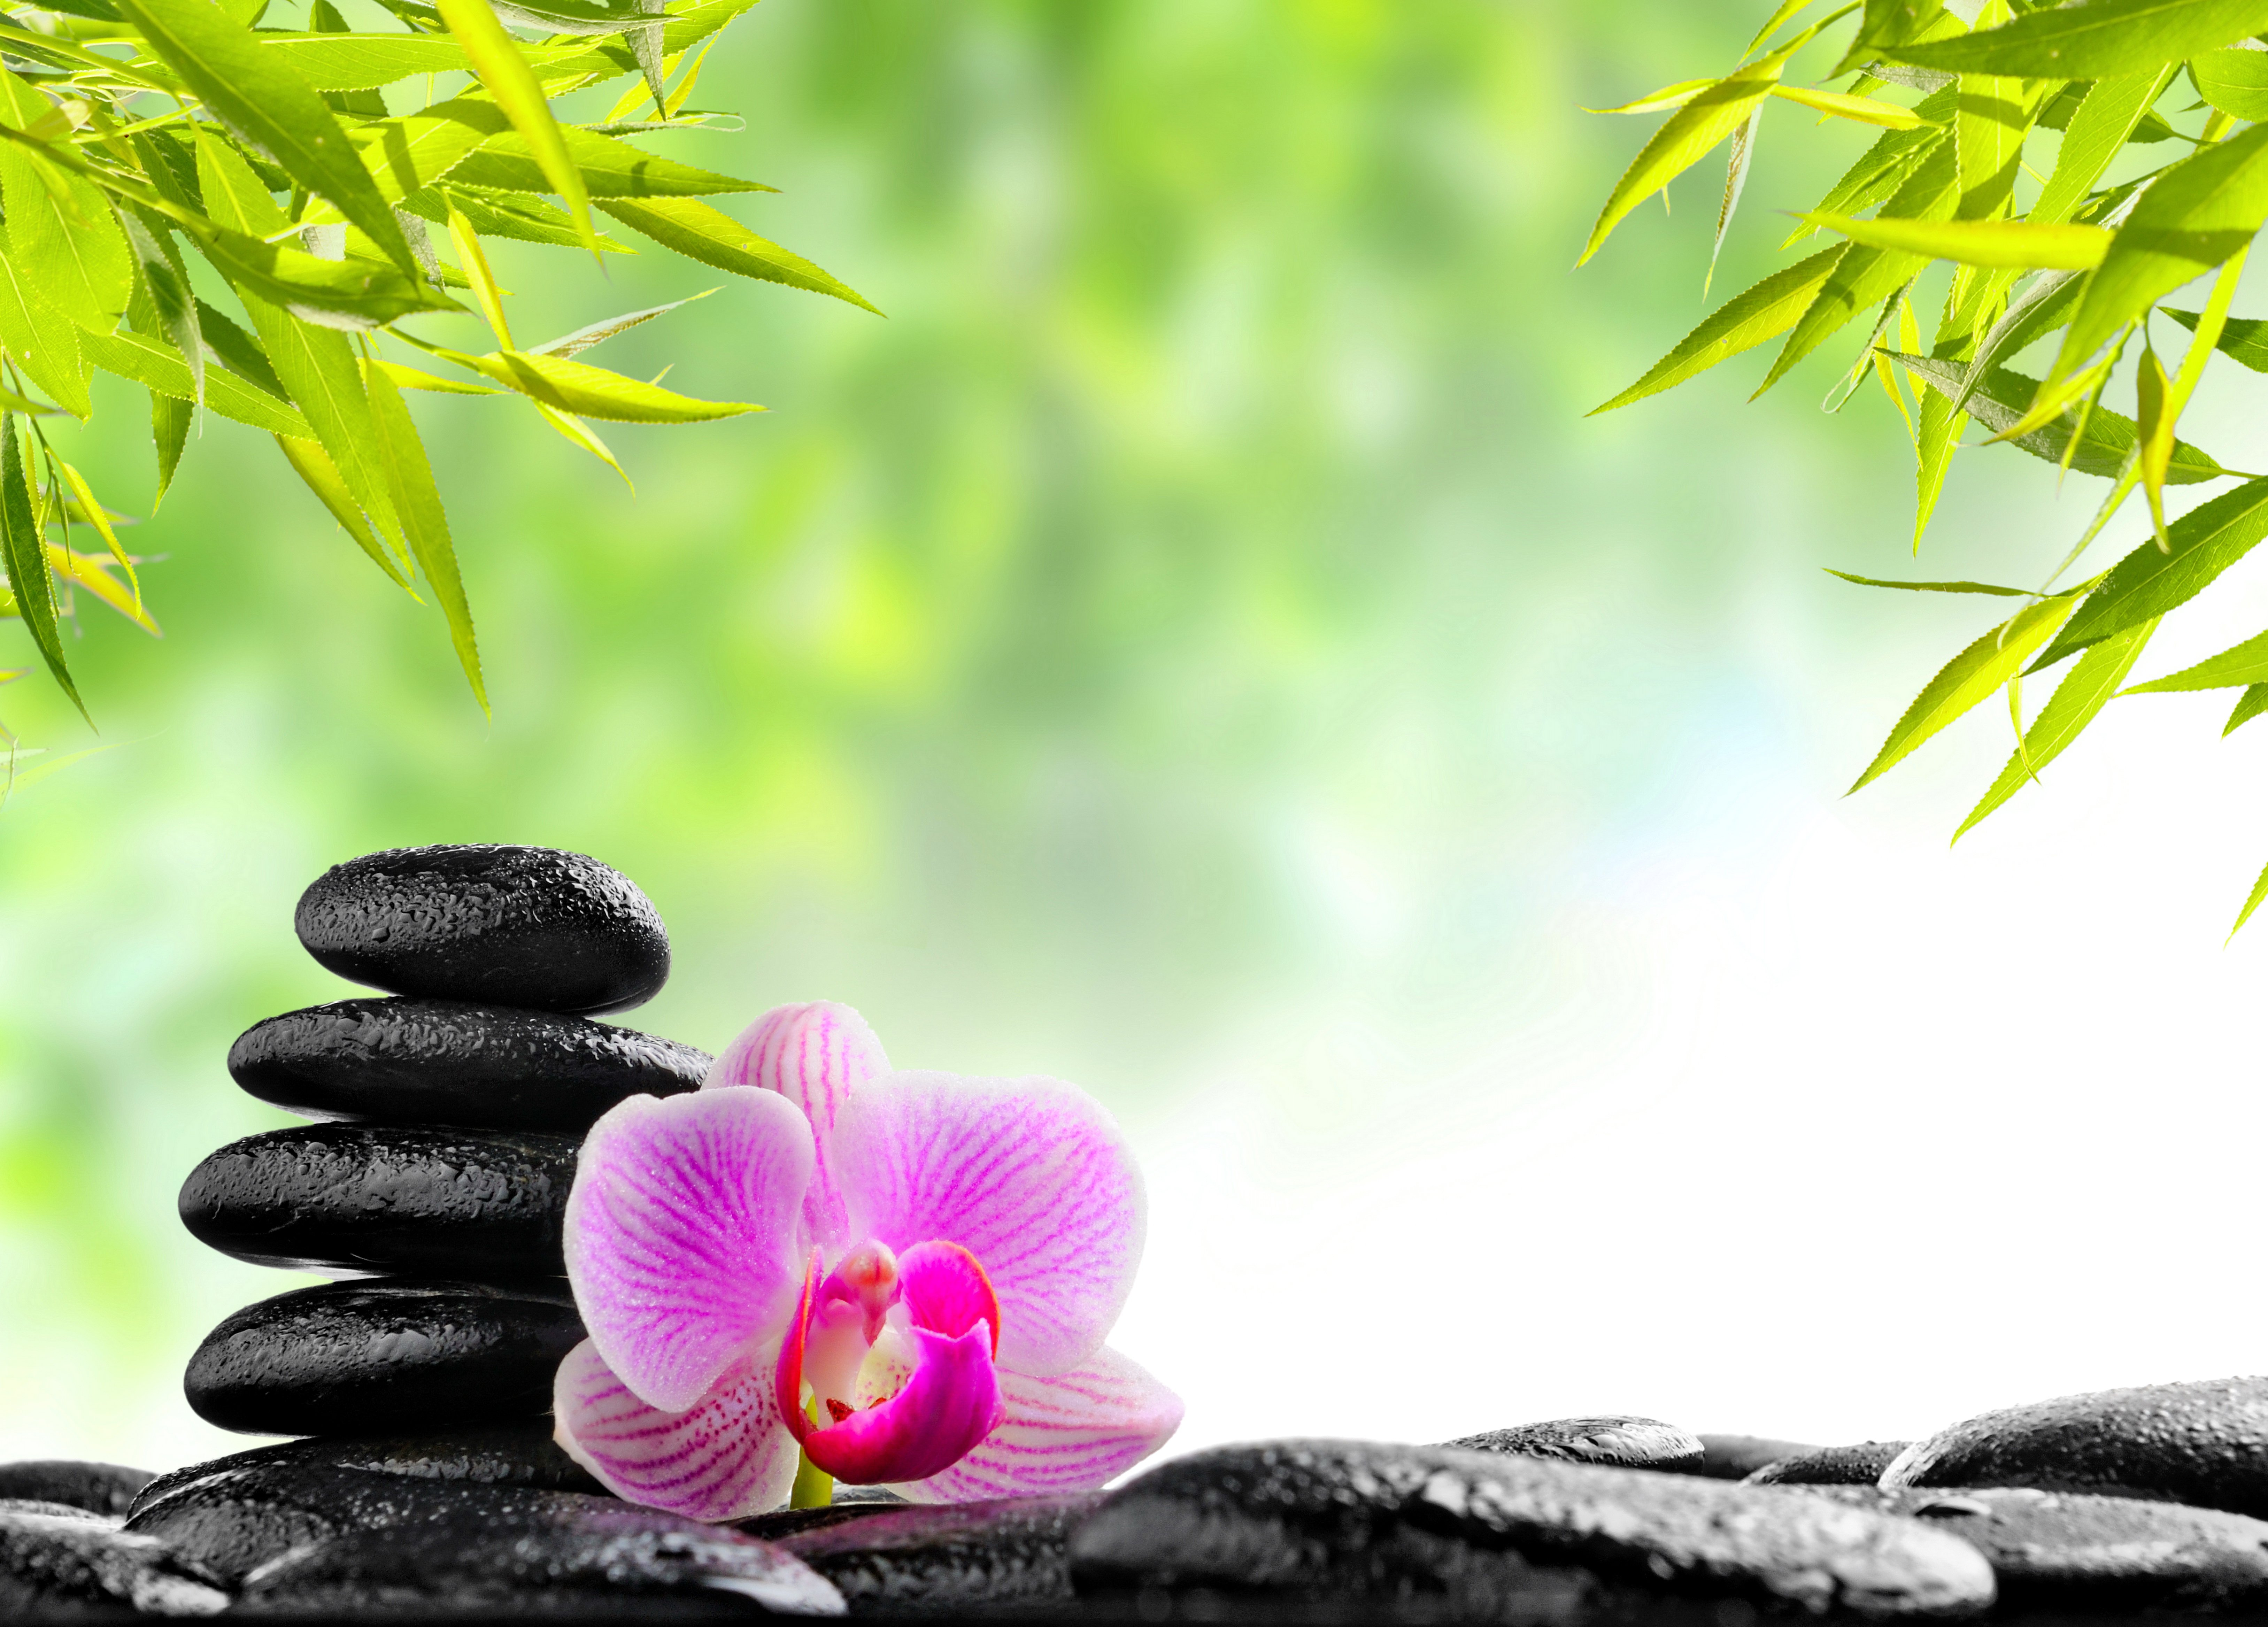 Lotus Flower Design Wall Paper : Zen mood bokeh garden buddhism religion wallpaper